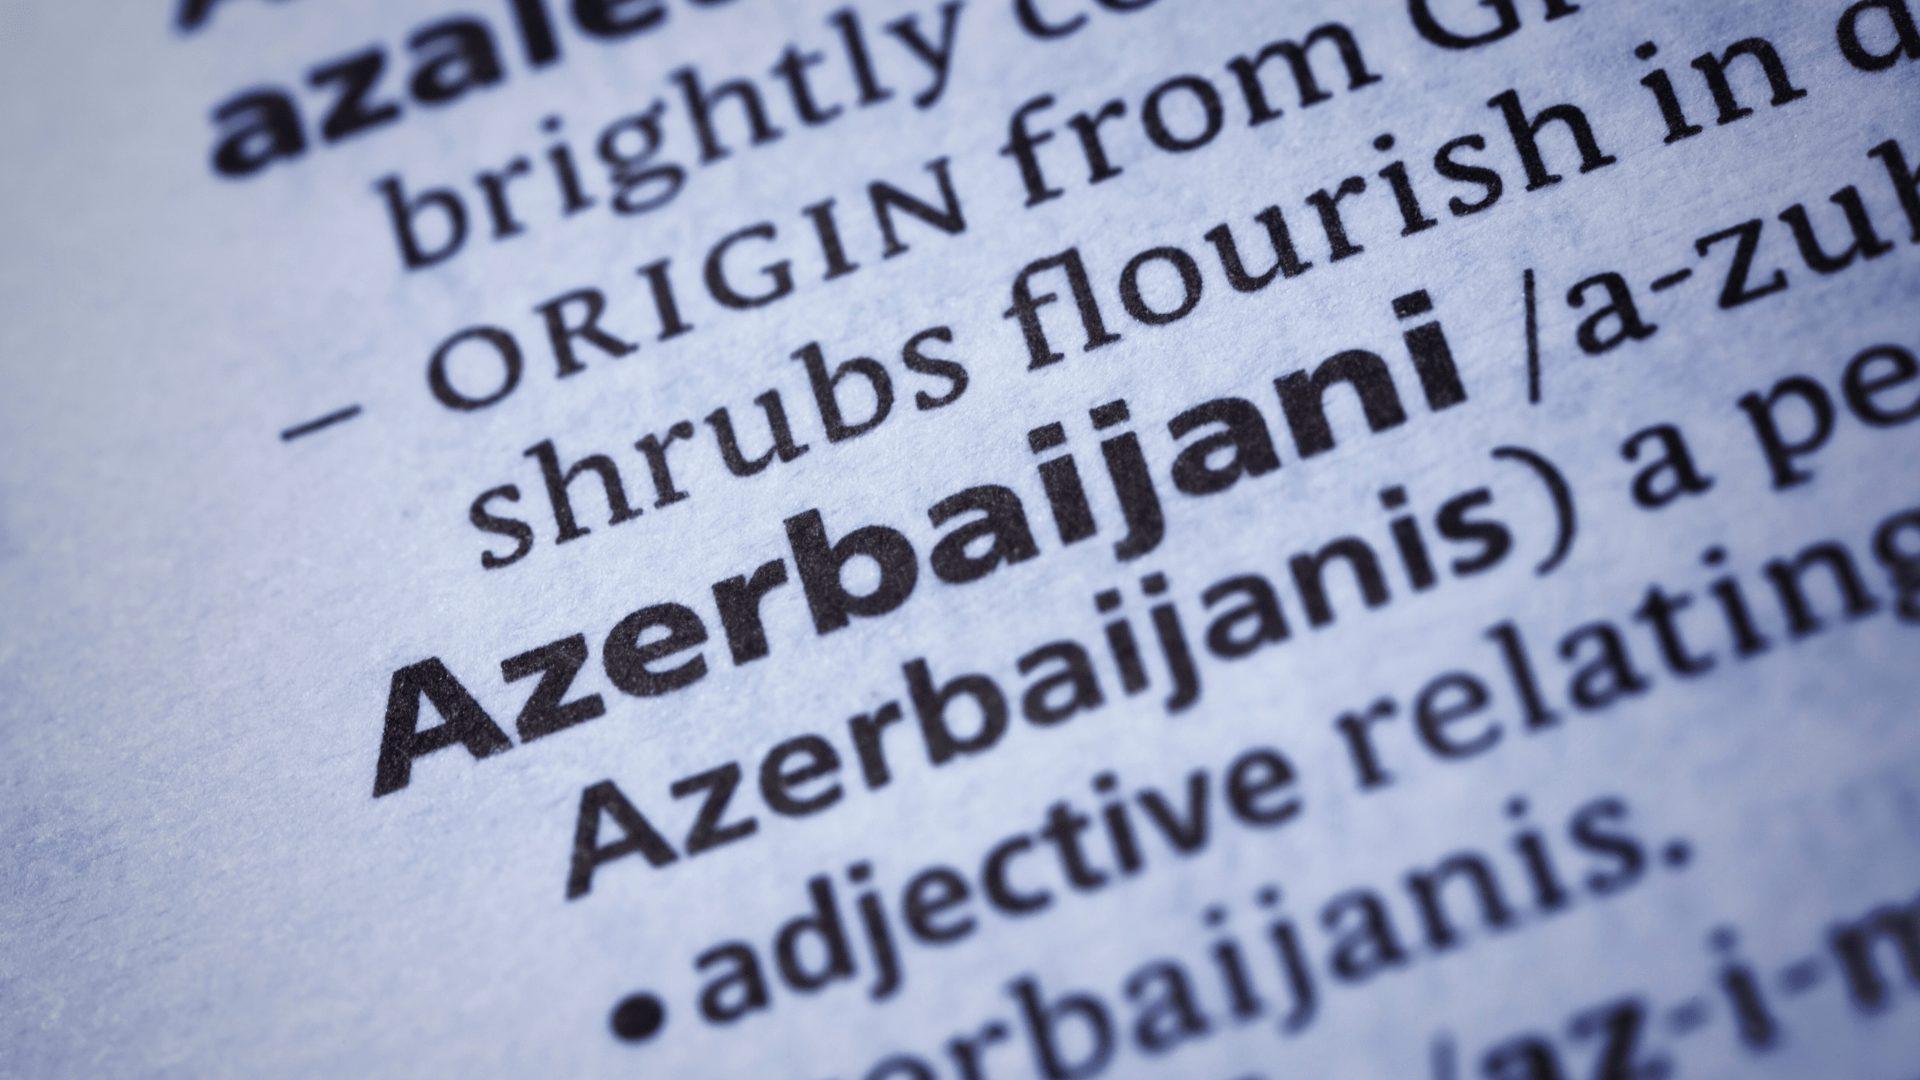 Azerbaijani Translation